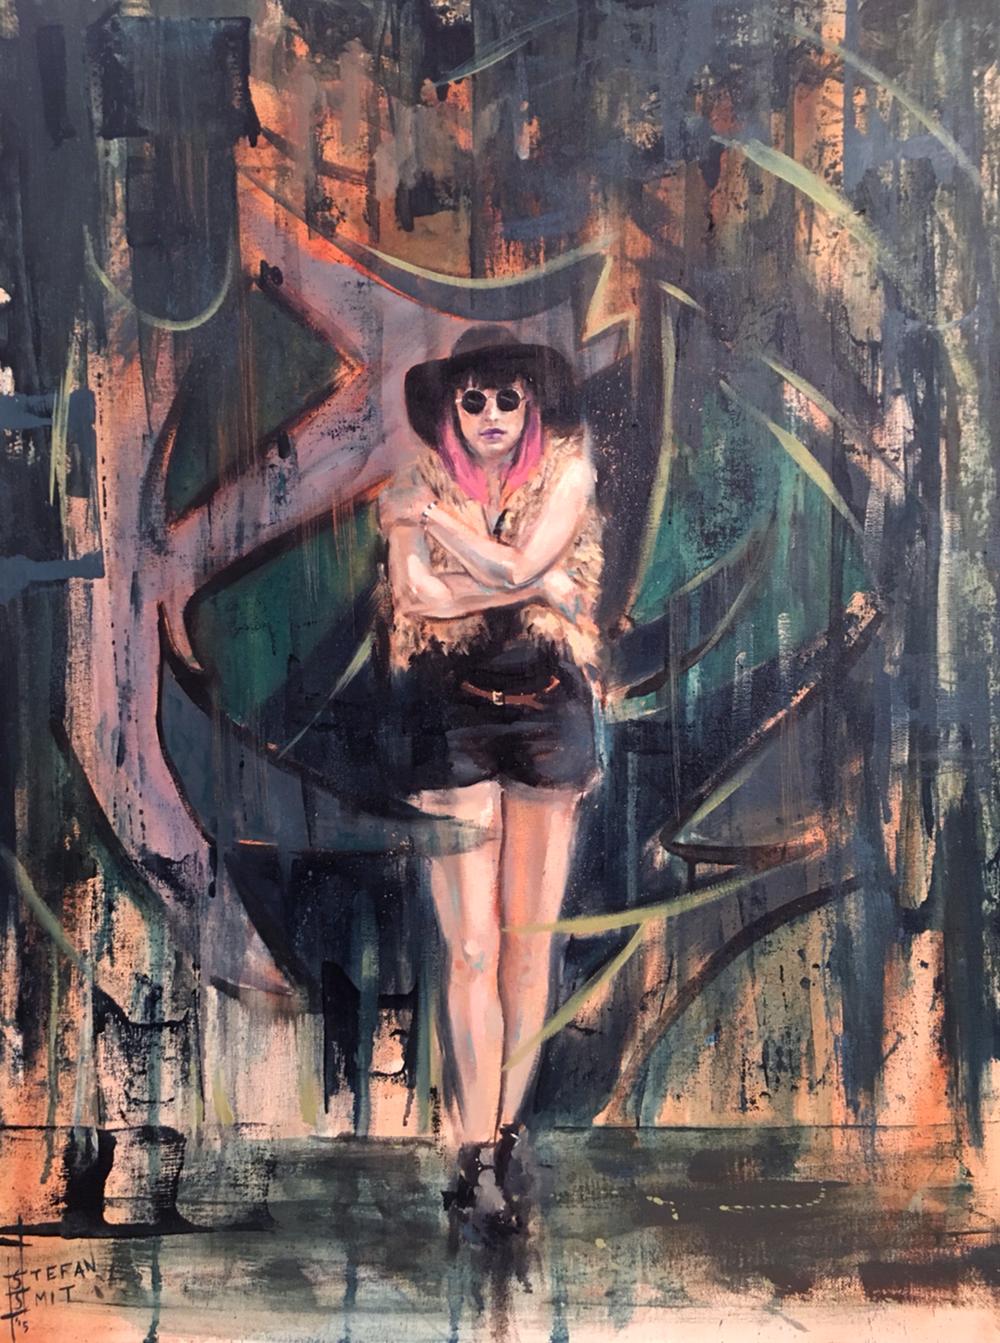 Stefan Smit  'Lines through Time'  Oil on canvas  71 x 56 cm